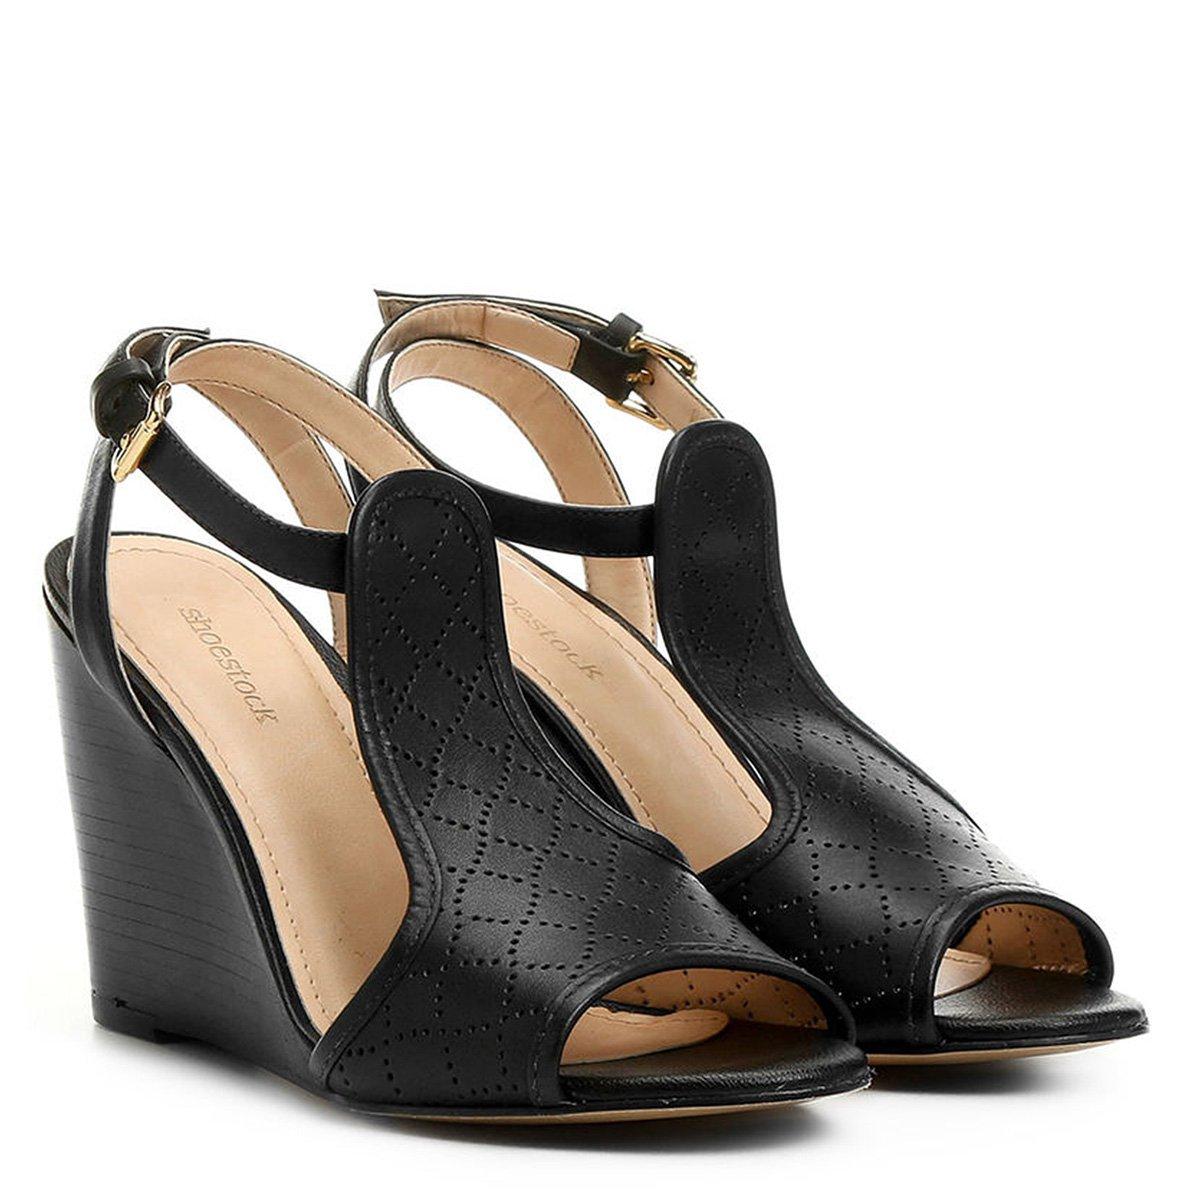 9ec19e79f7 Sandália Anabela Couro Shoestock Laser Feminina | Shoestock